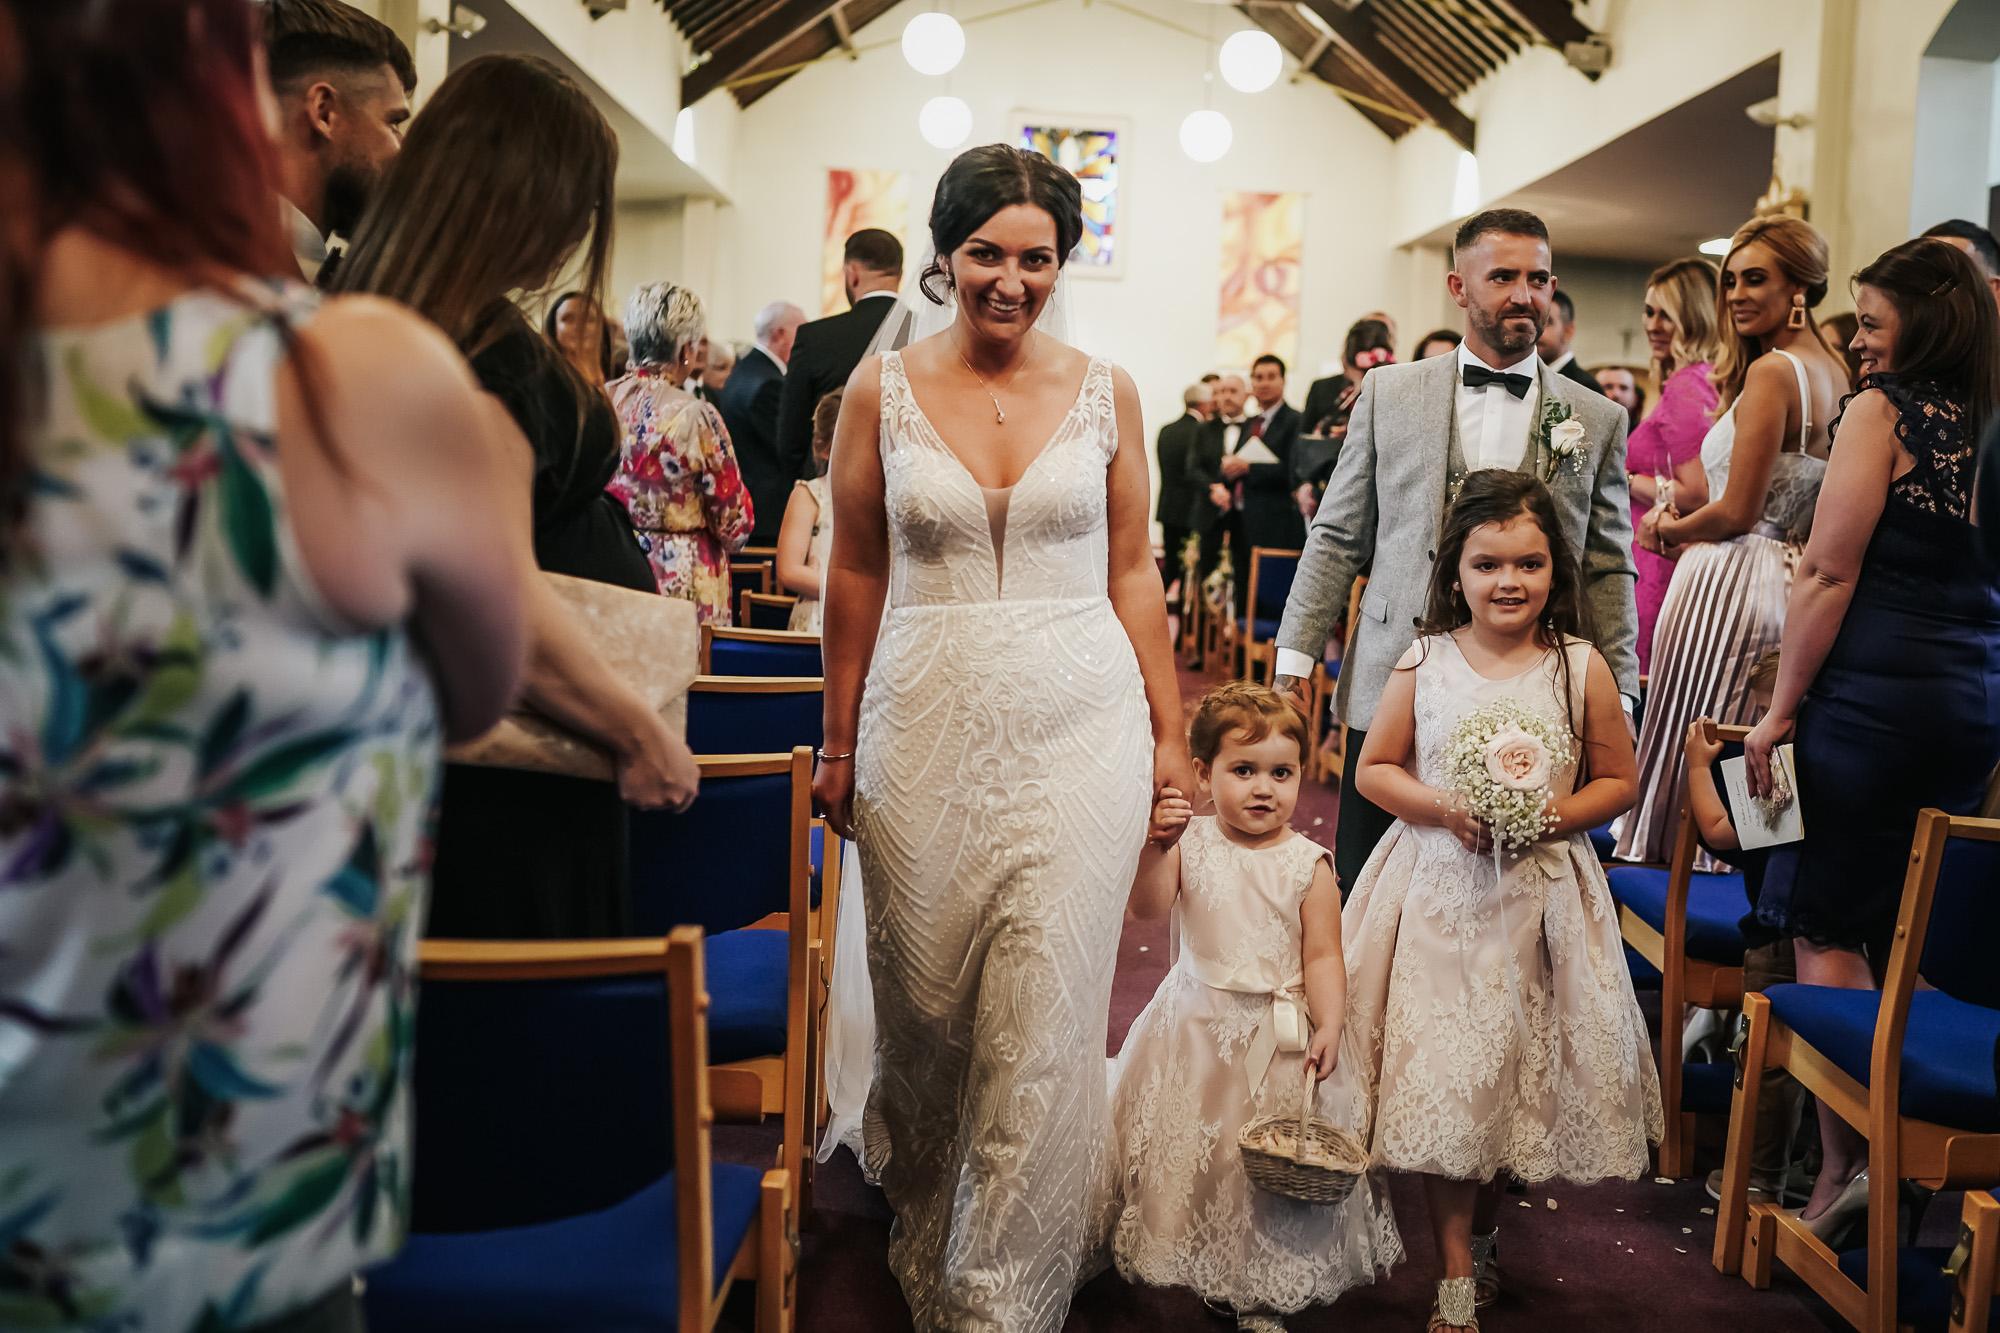 The Hayloft Wedding Photography Cheshire wedding photographer (26 of 52).jpg